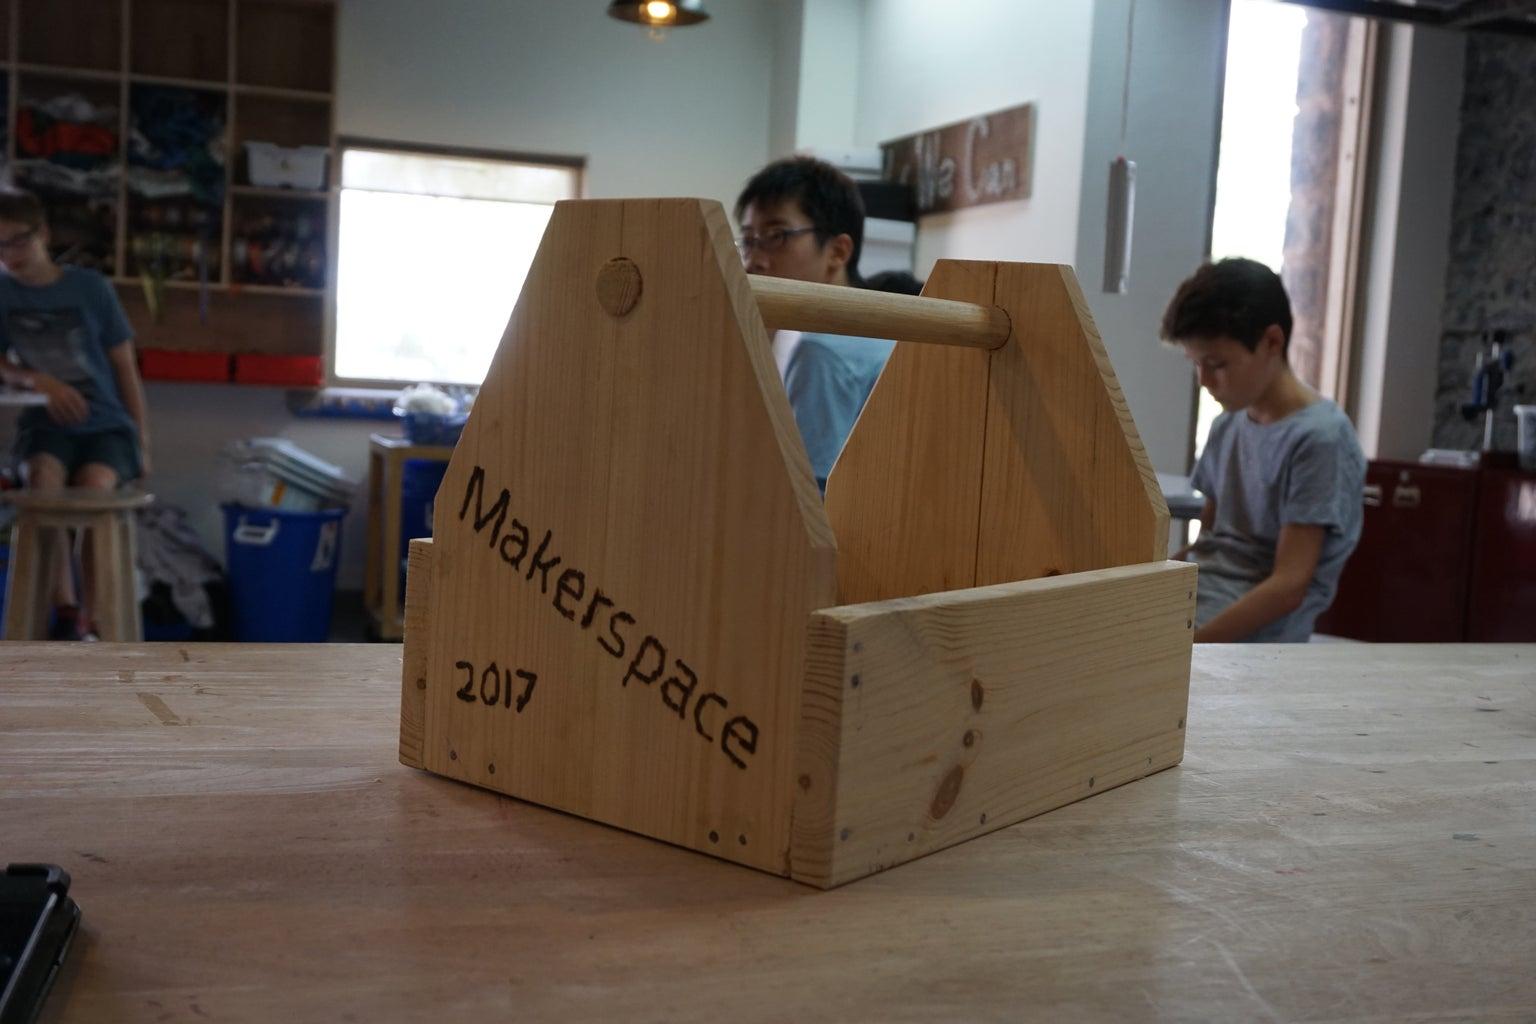 Makerspace Toolbox